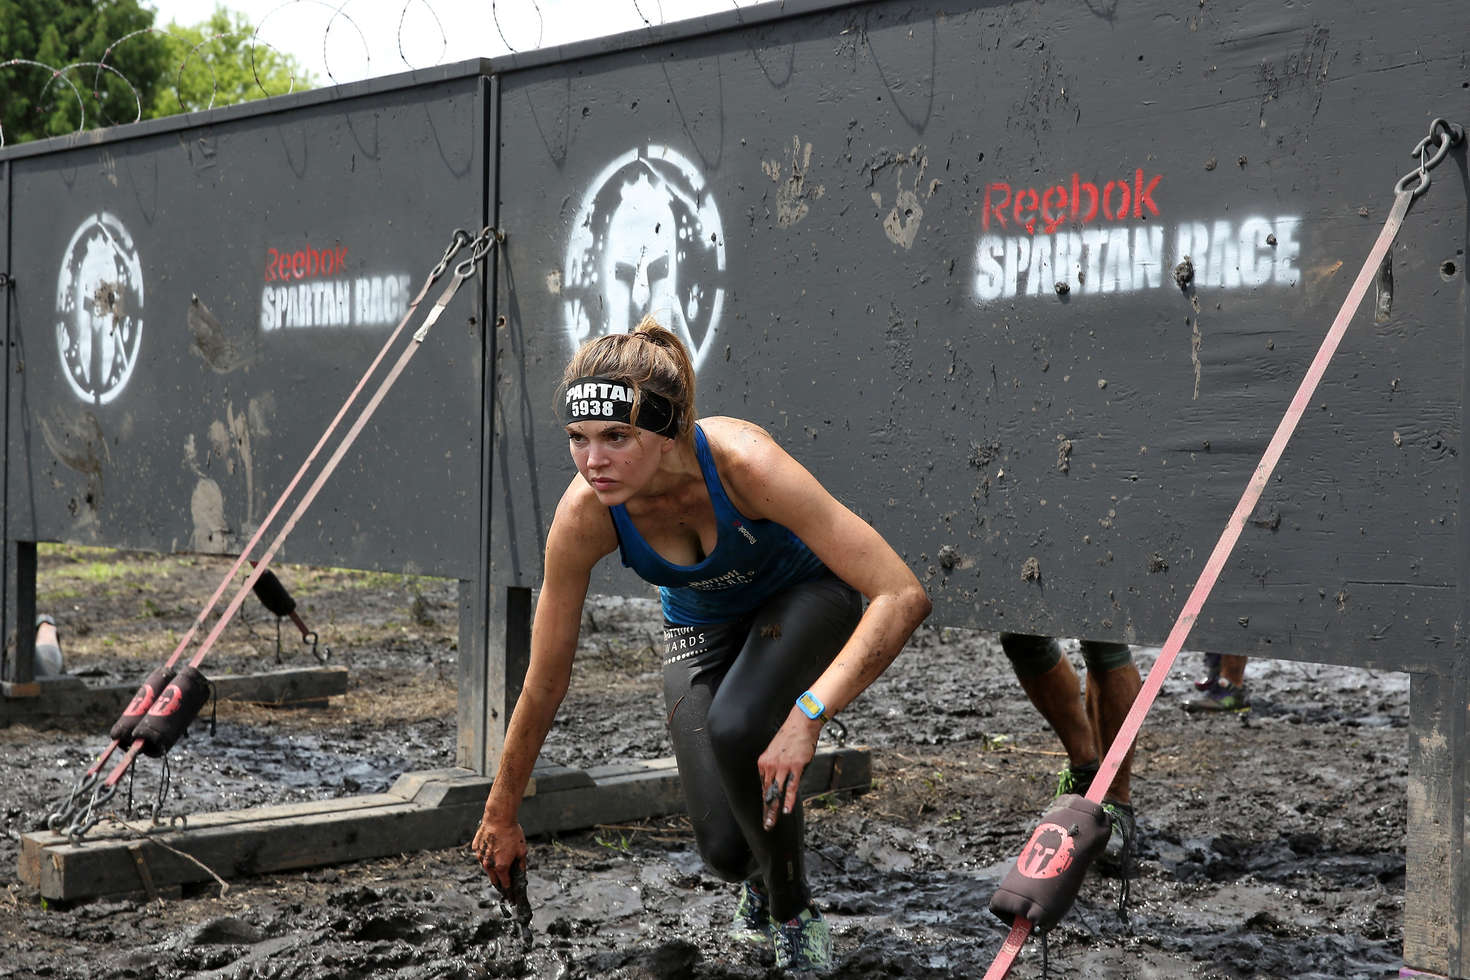 Aimee Teegarden 2016 : Aimee Teegarden: Competing in the Spartan Super Race -01